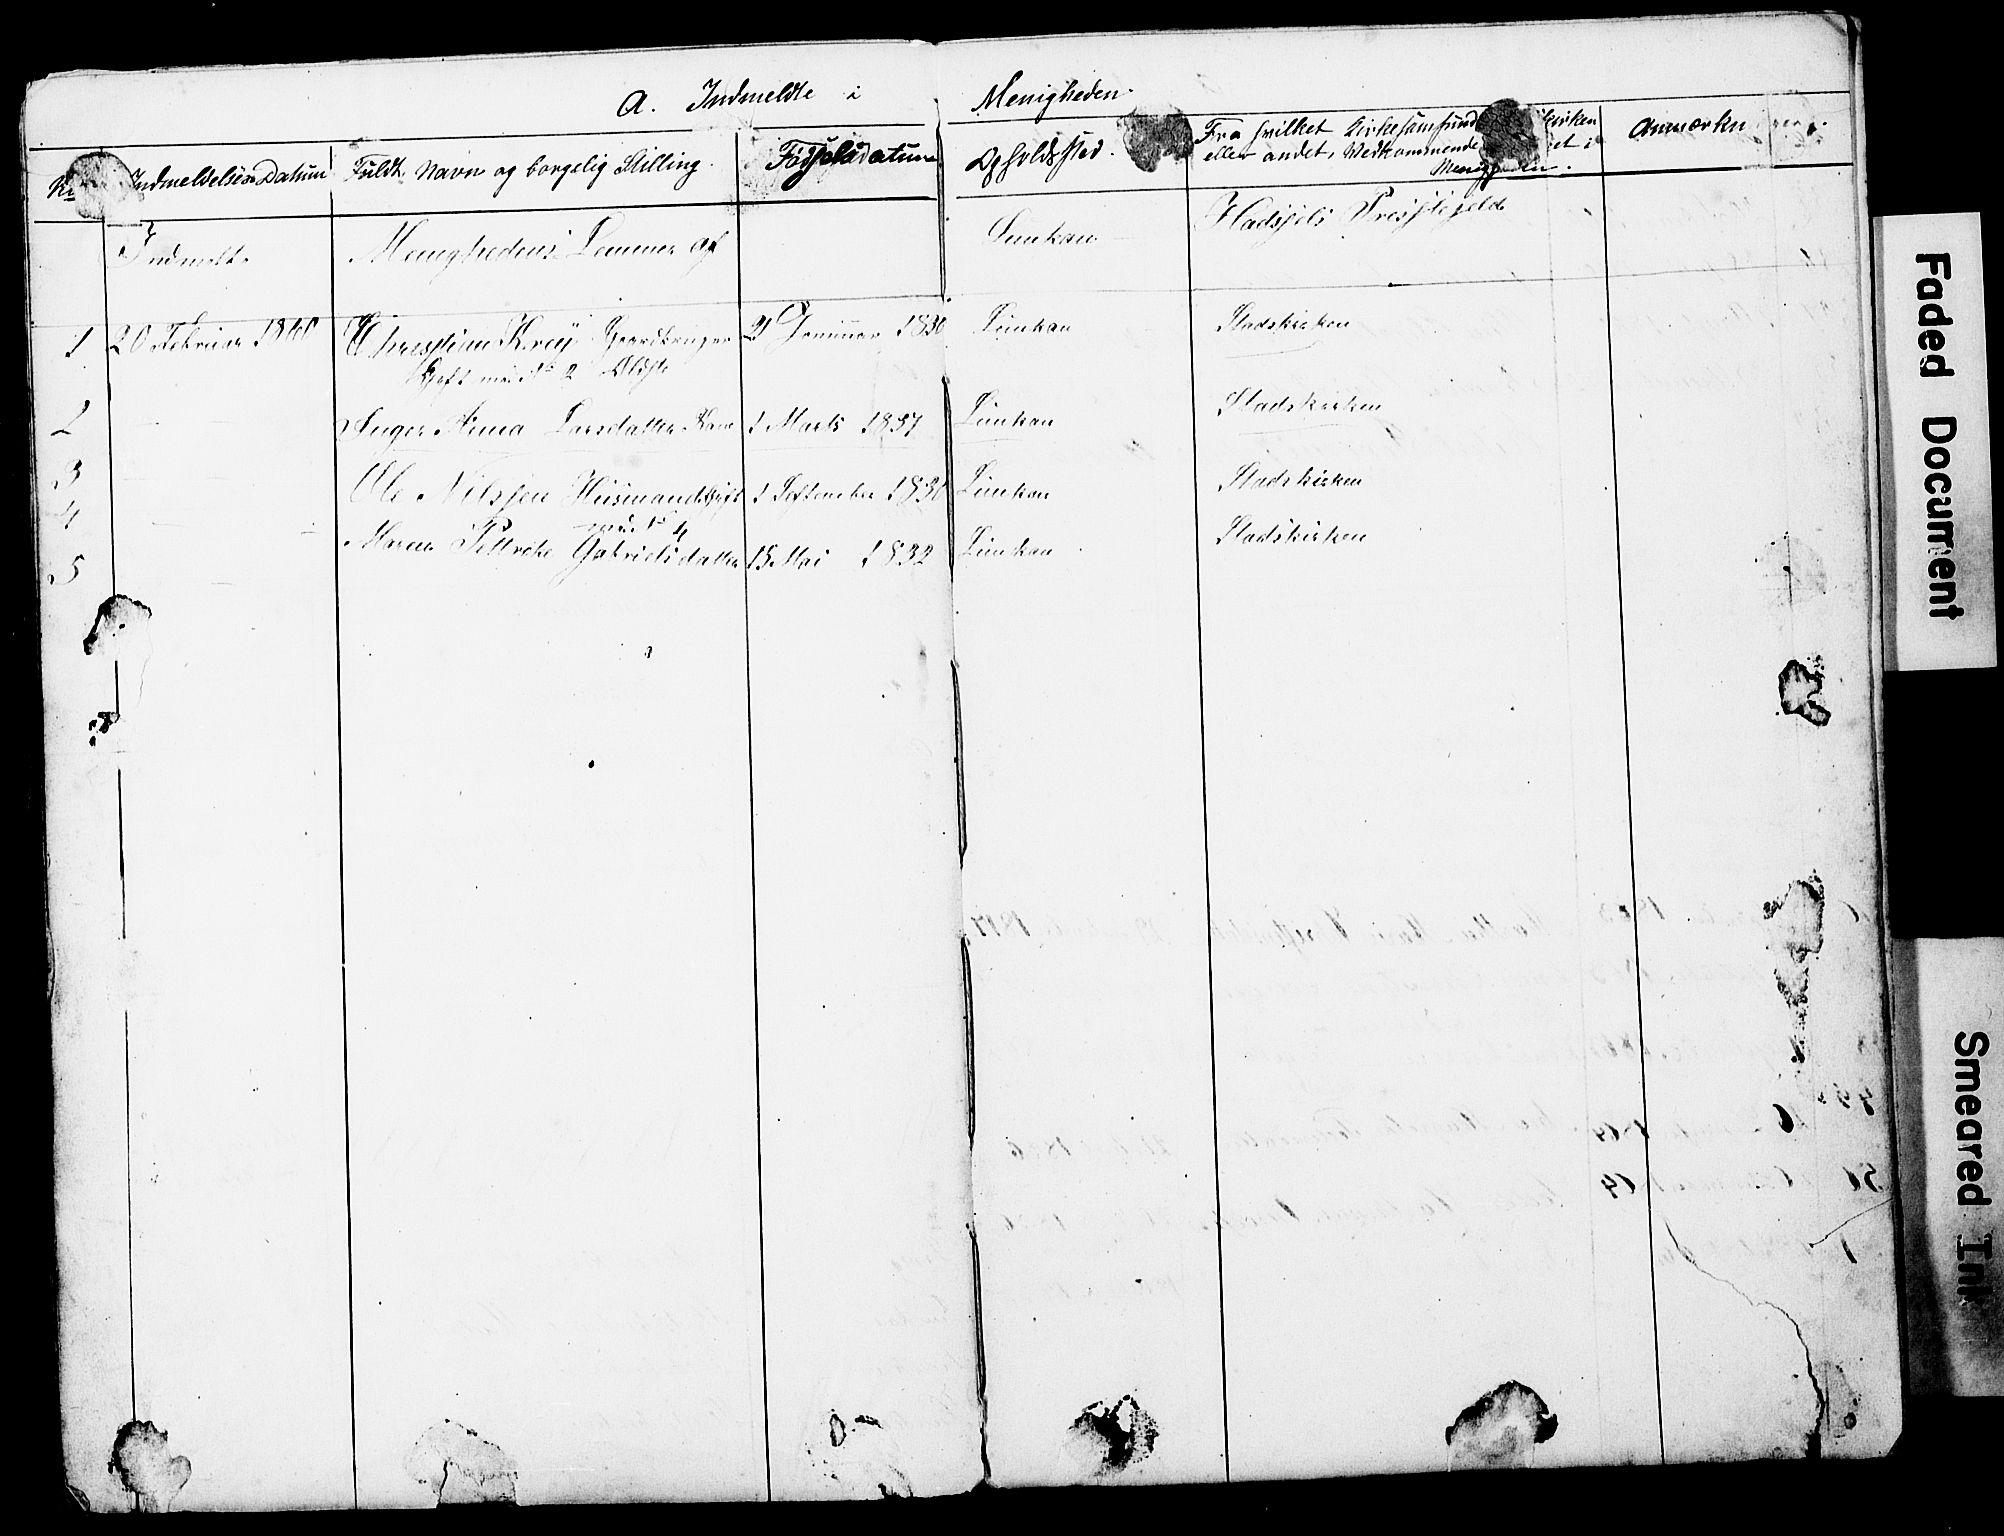 SAT, Ministerialprotokoller, klokkerbøker og fødselsregistre - Nordland, 897/L1418: Dissenter register no. 897D01, 1859-1883